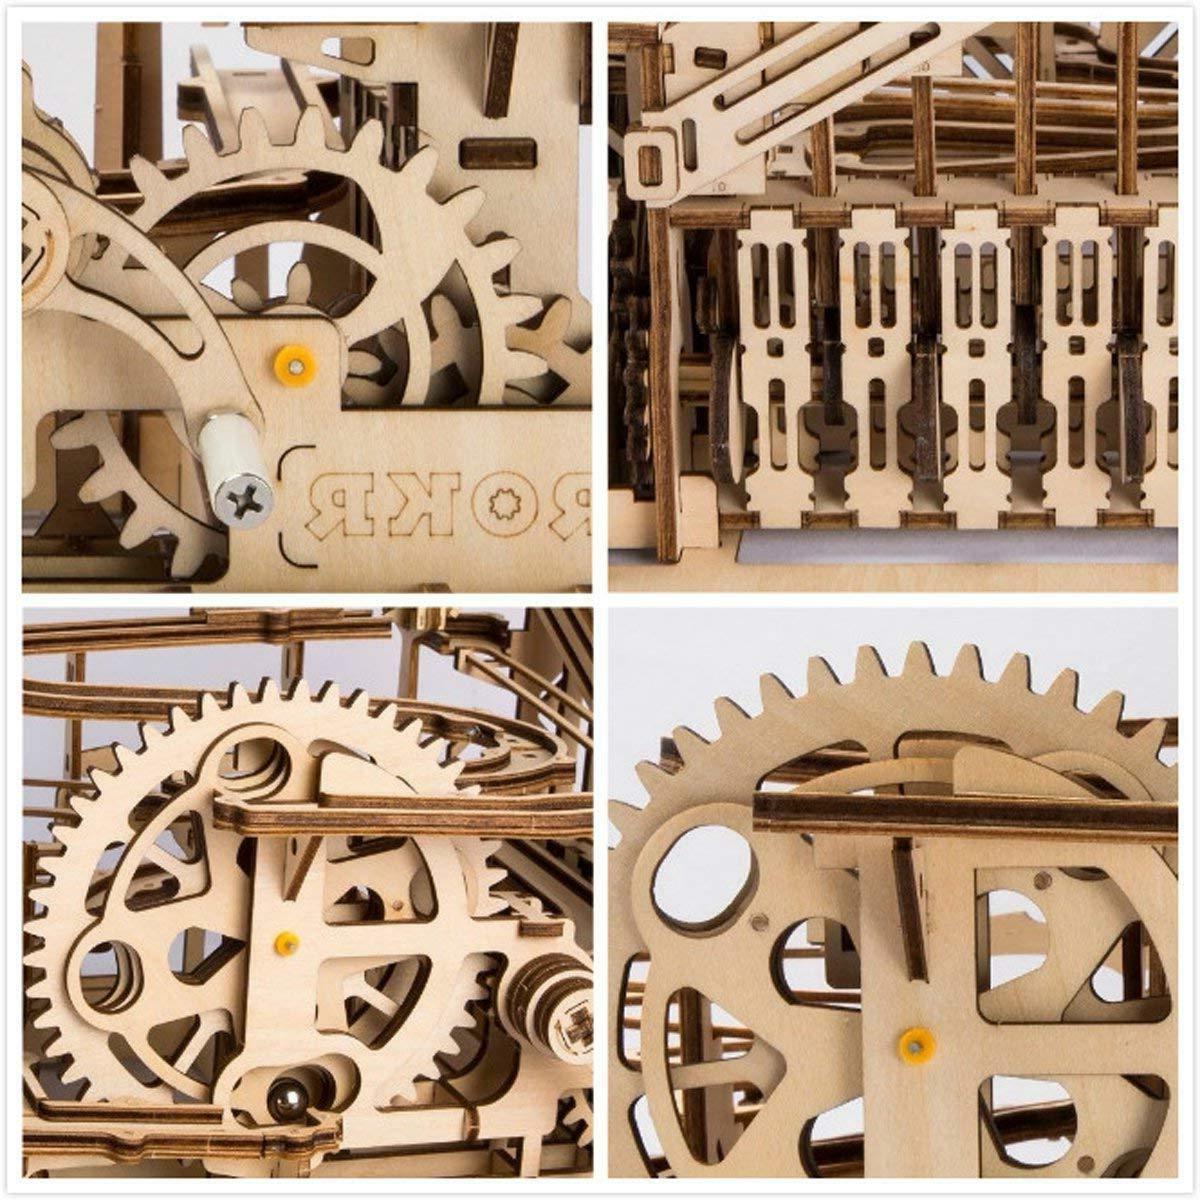 ROBOTIME Run Model Construction Building Toy